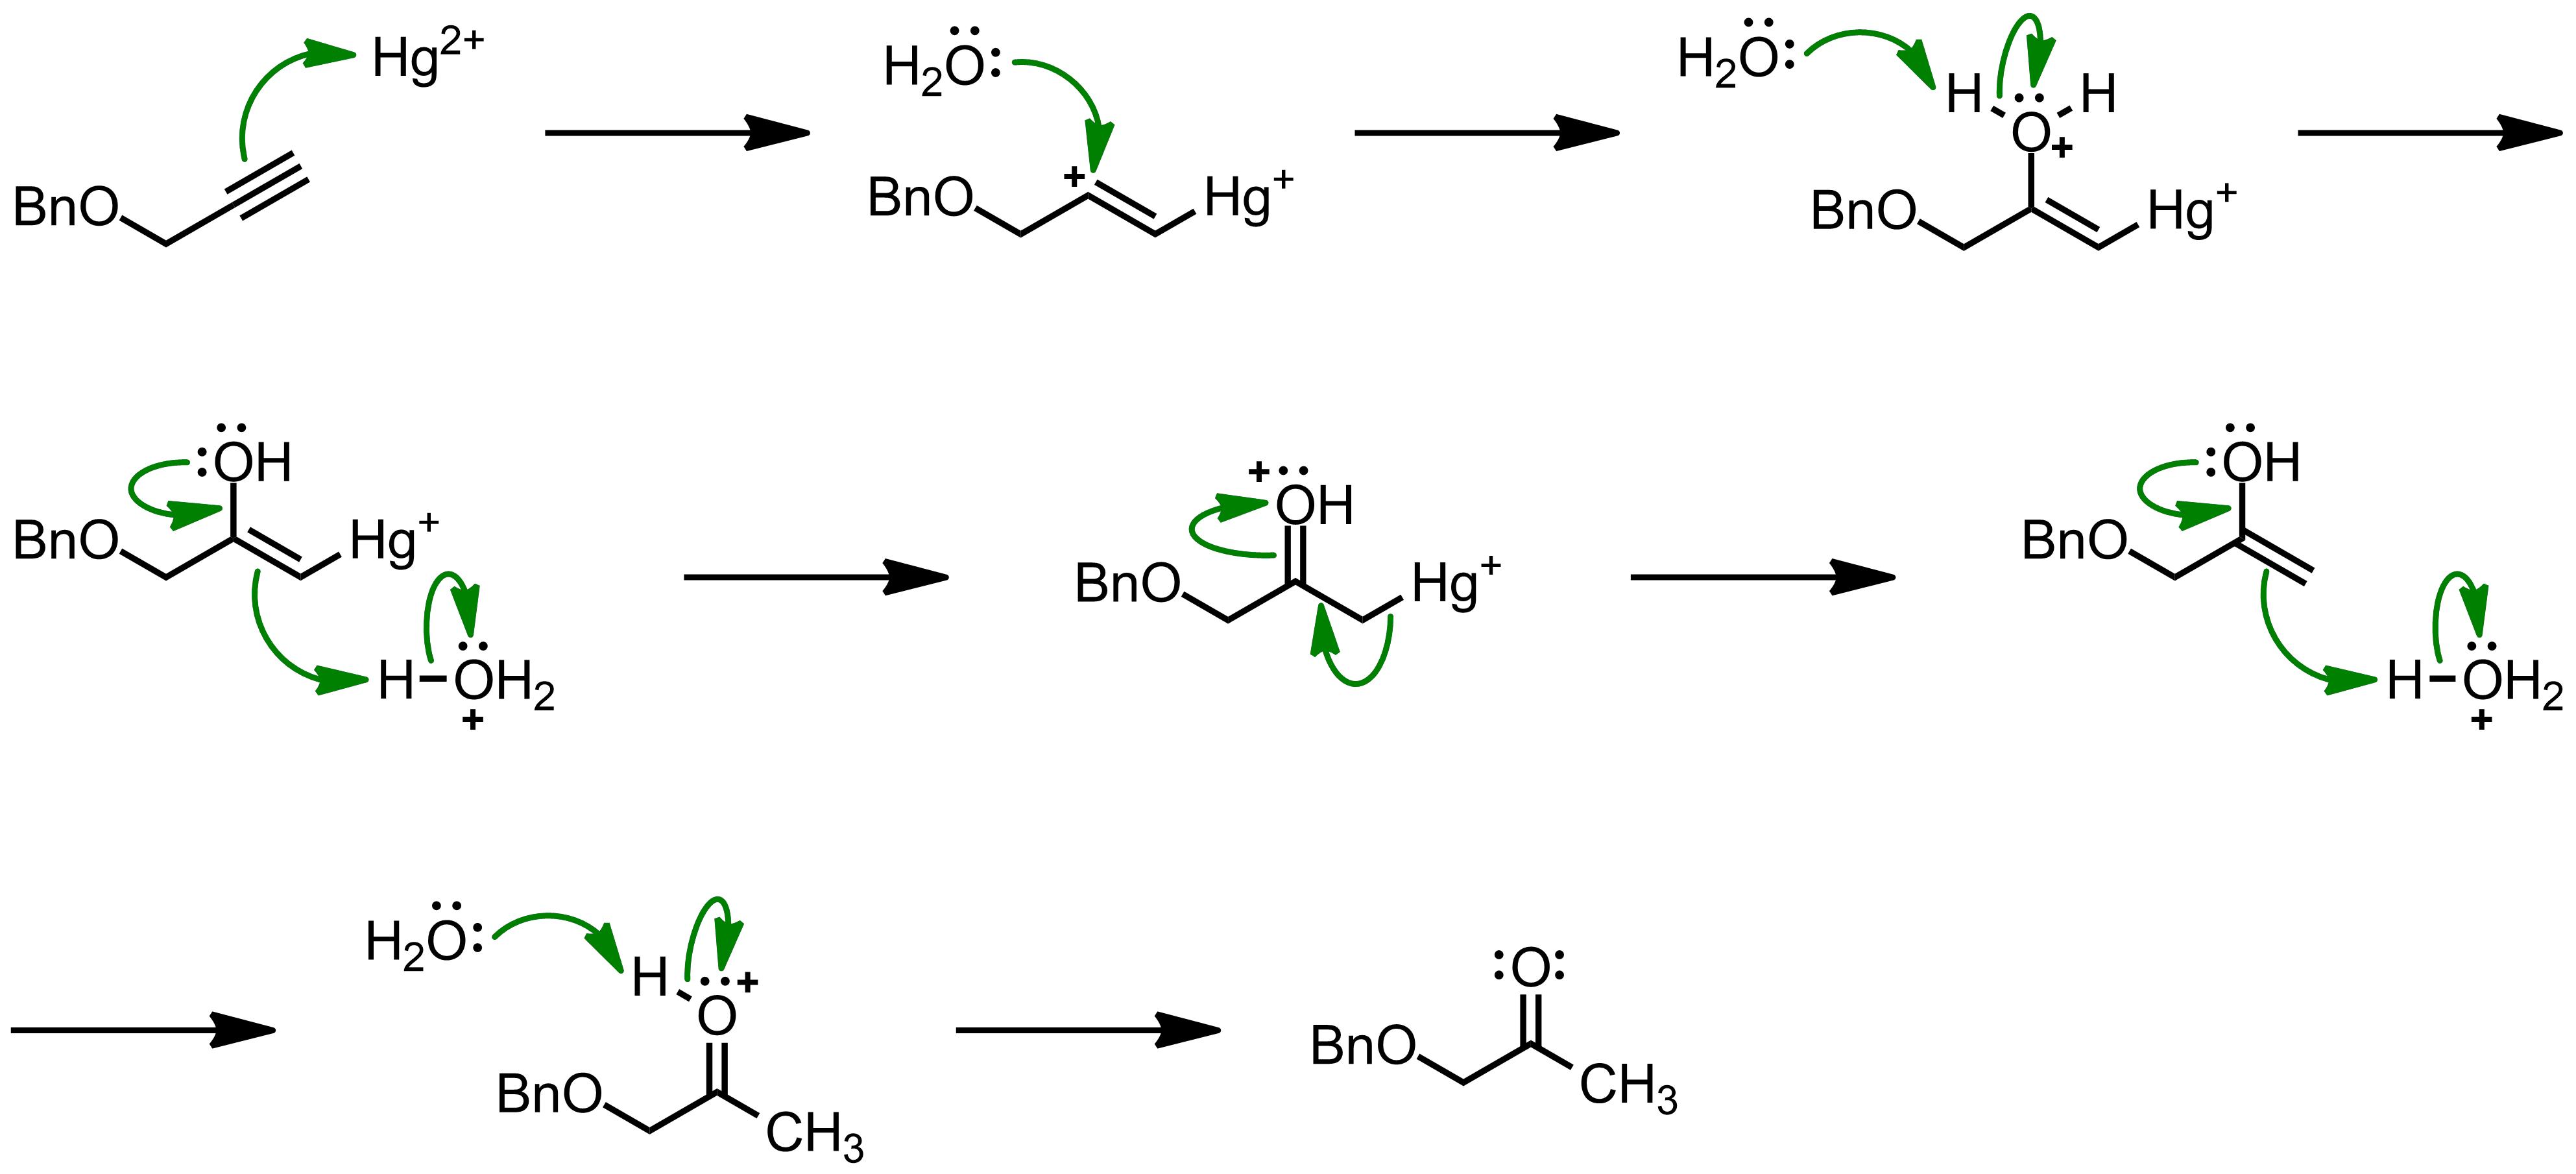 Mechanism of the Kucherov Reaction